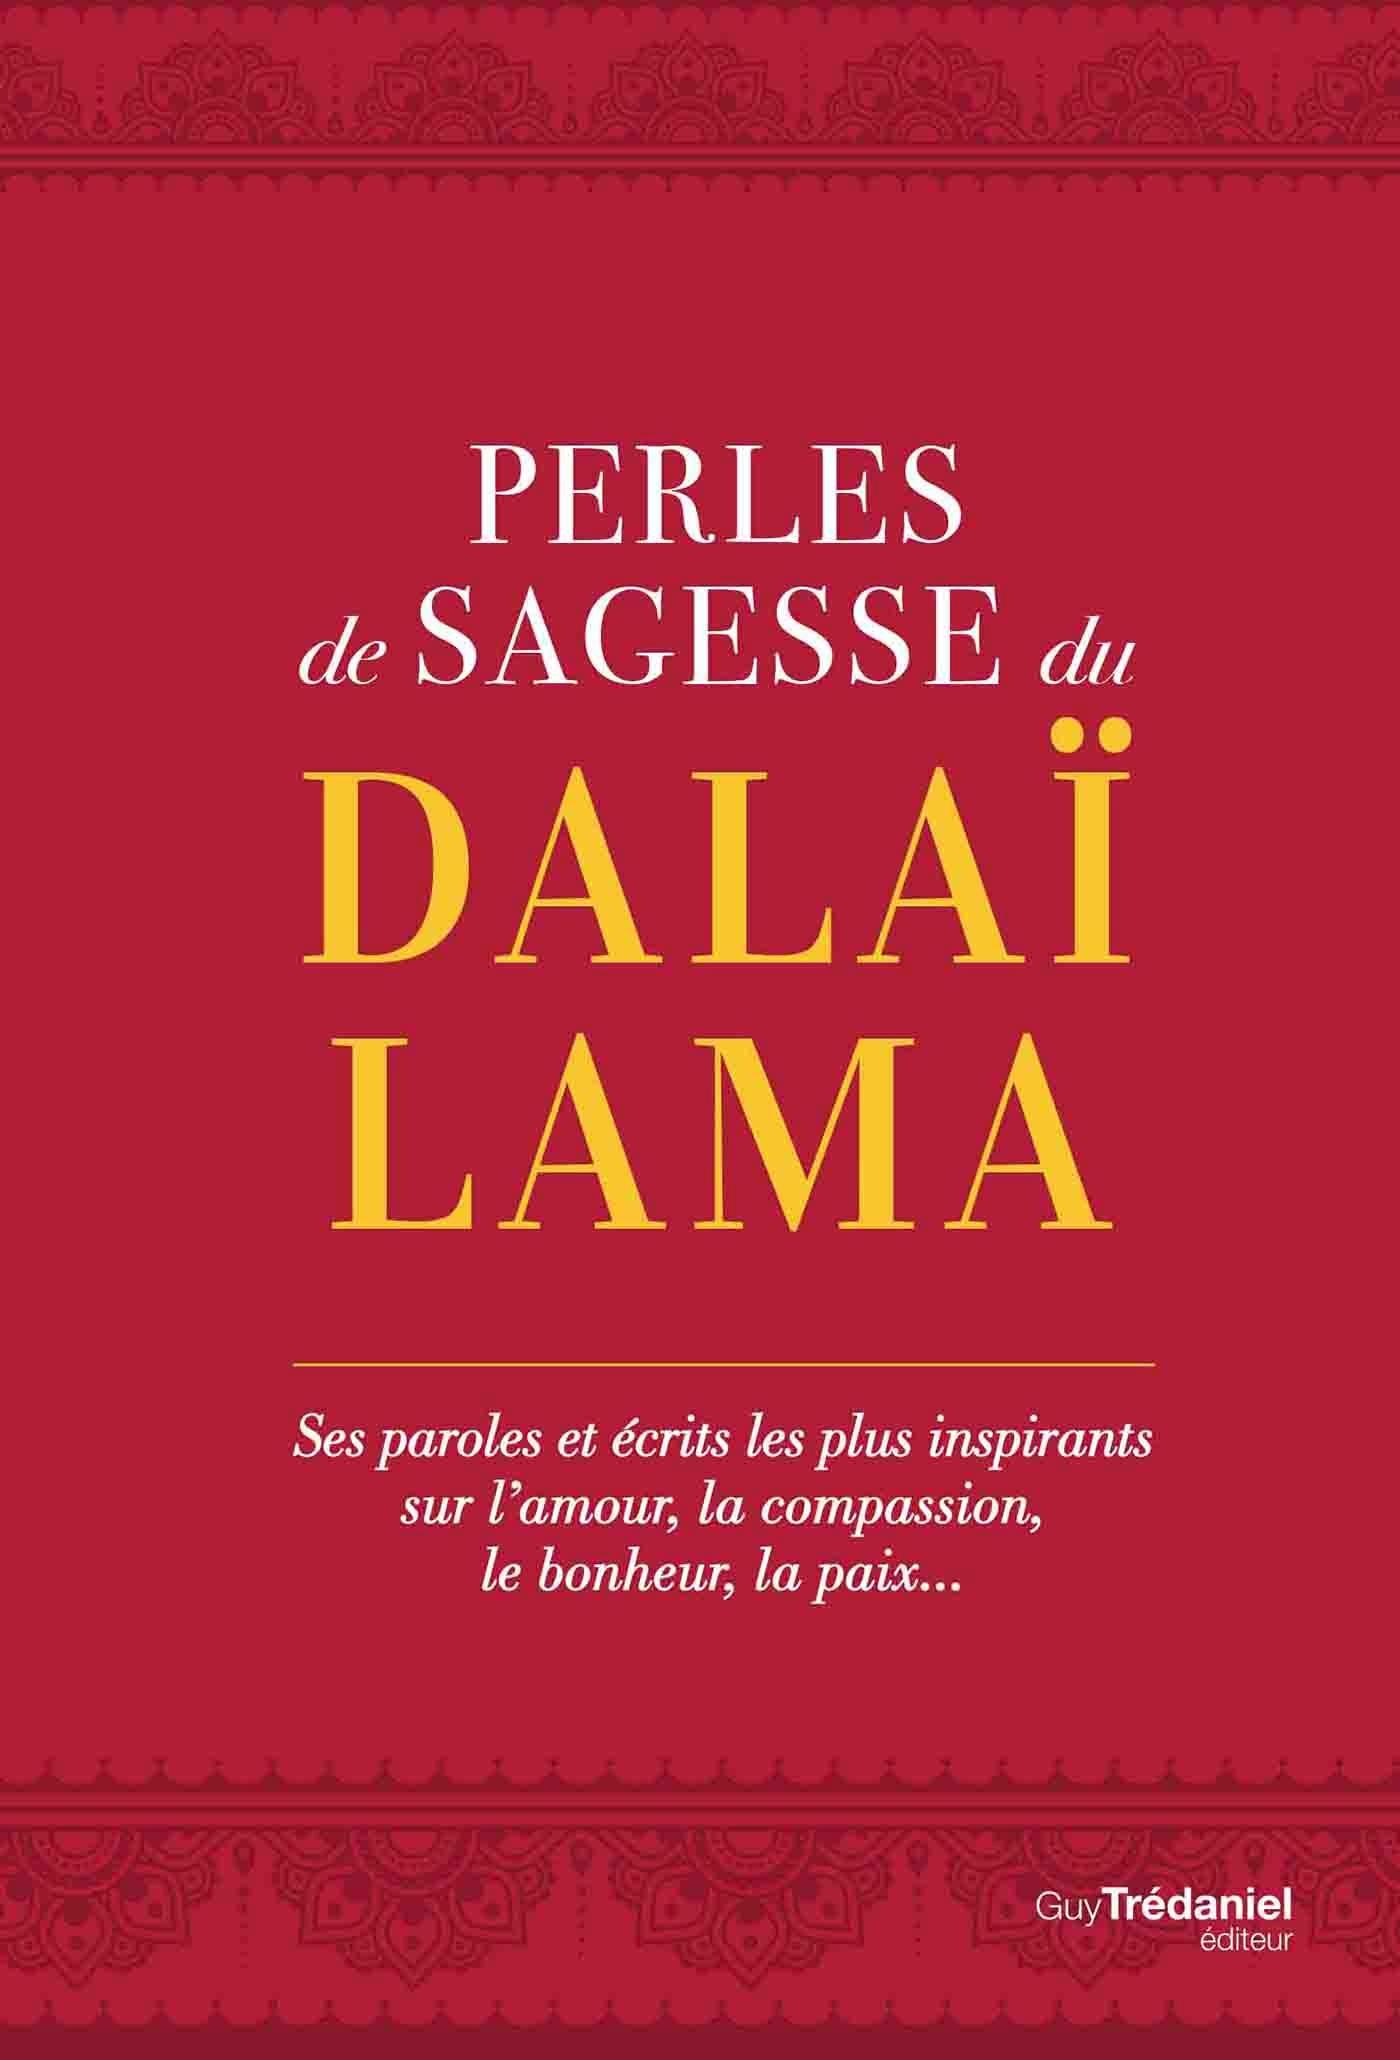 Perles de sagesse du Dalaï lama